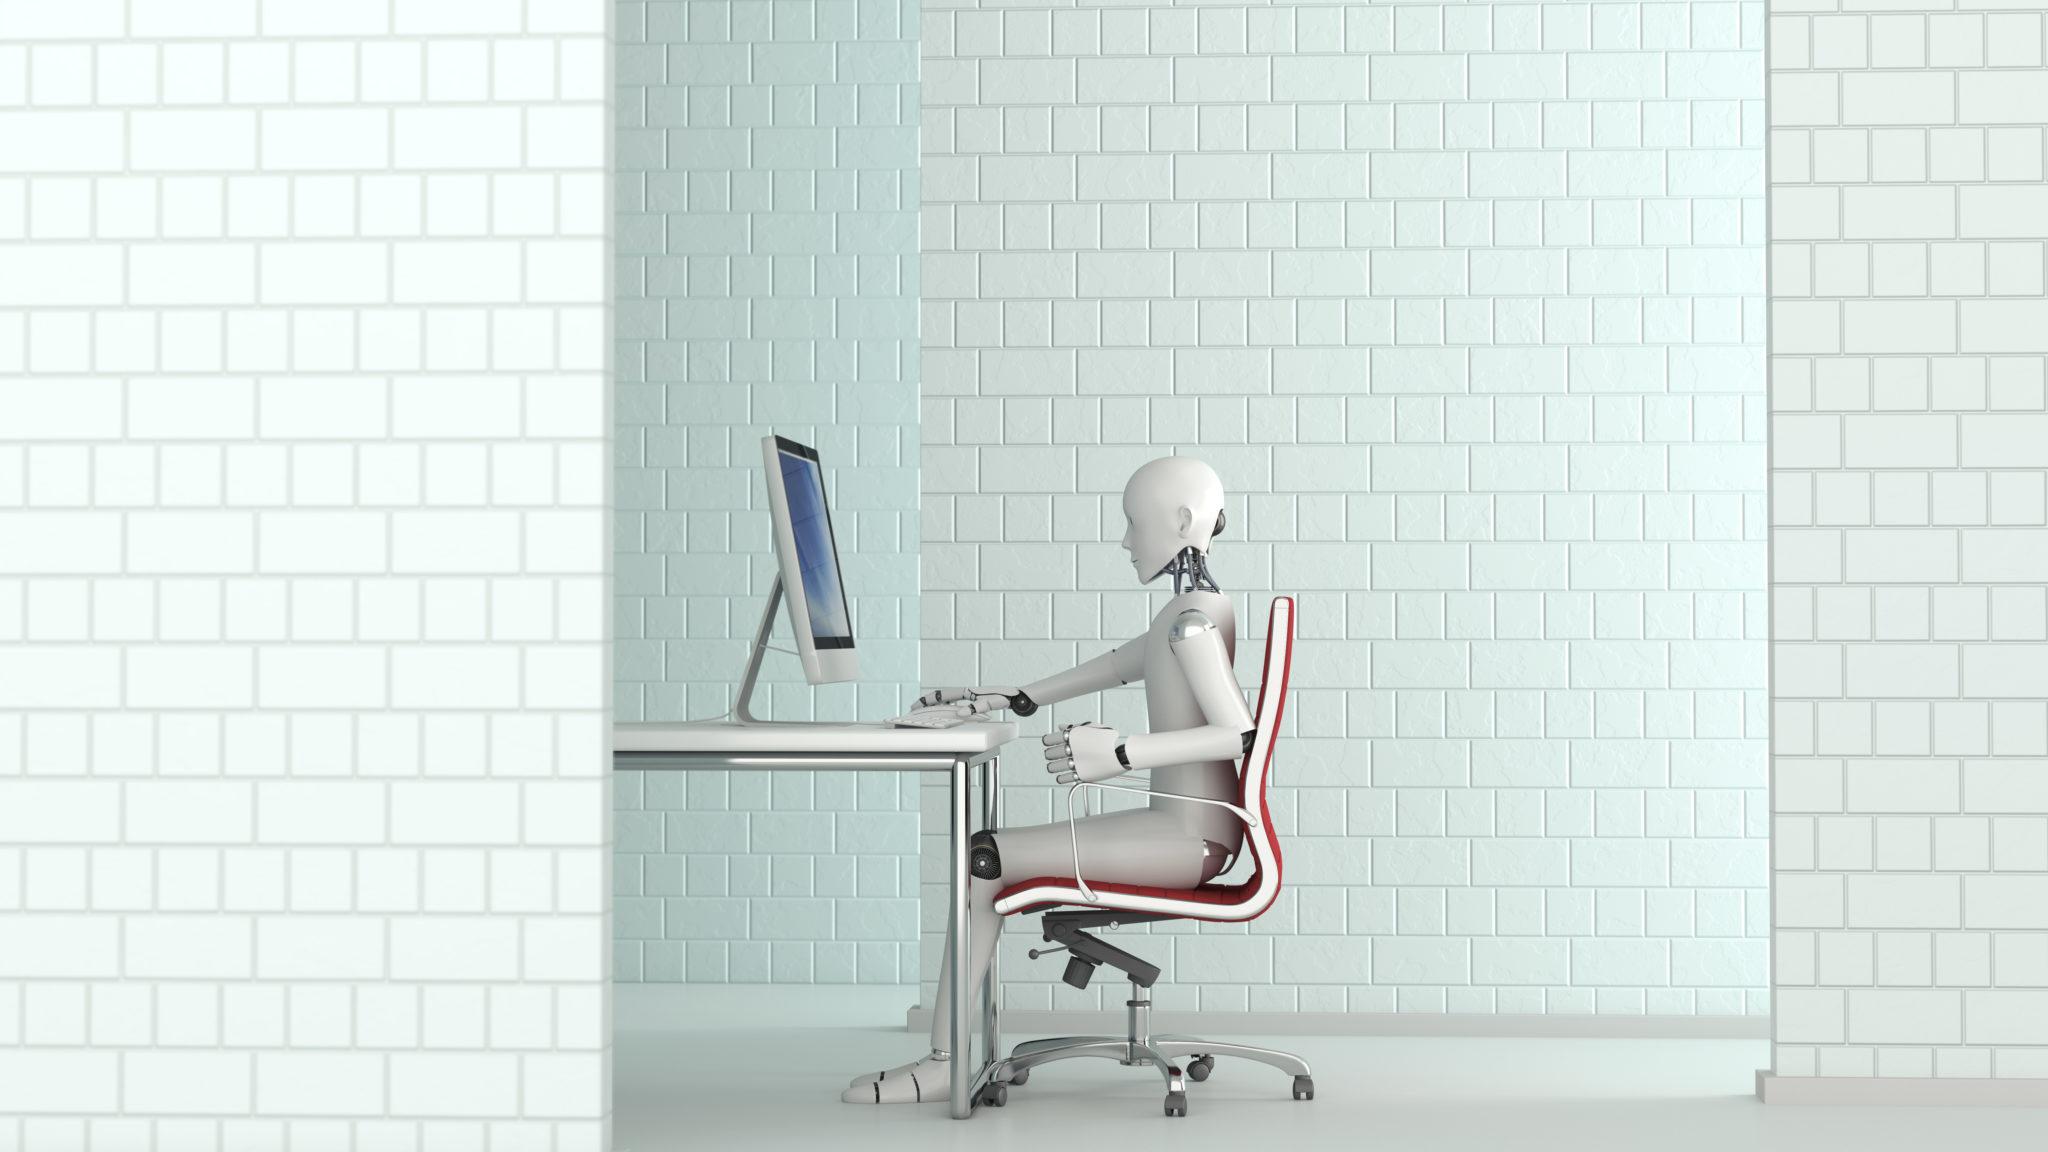 Robot working at desk, 3D Rendering